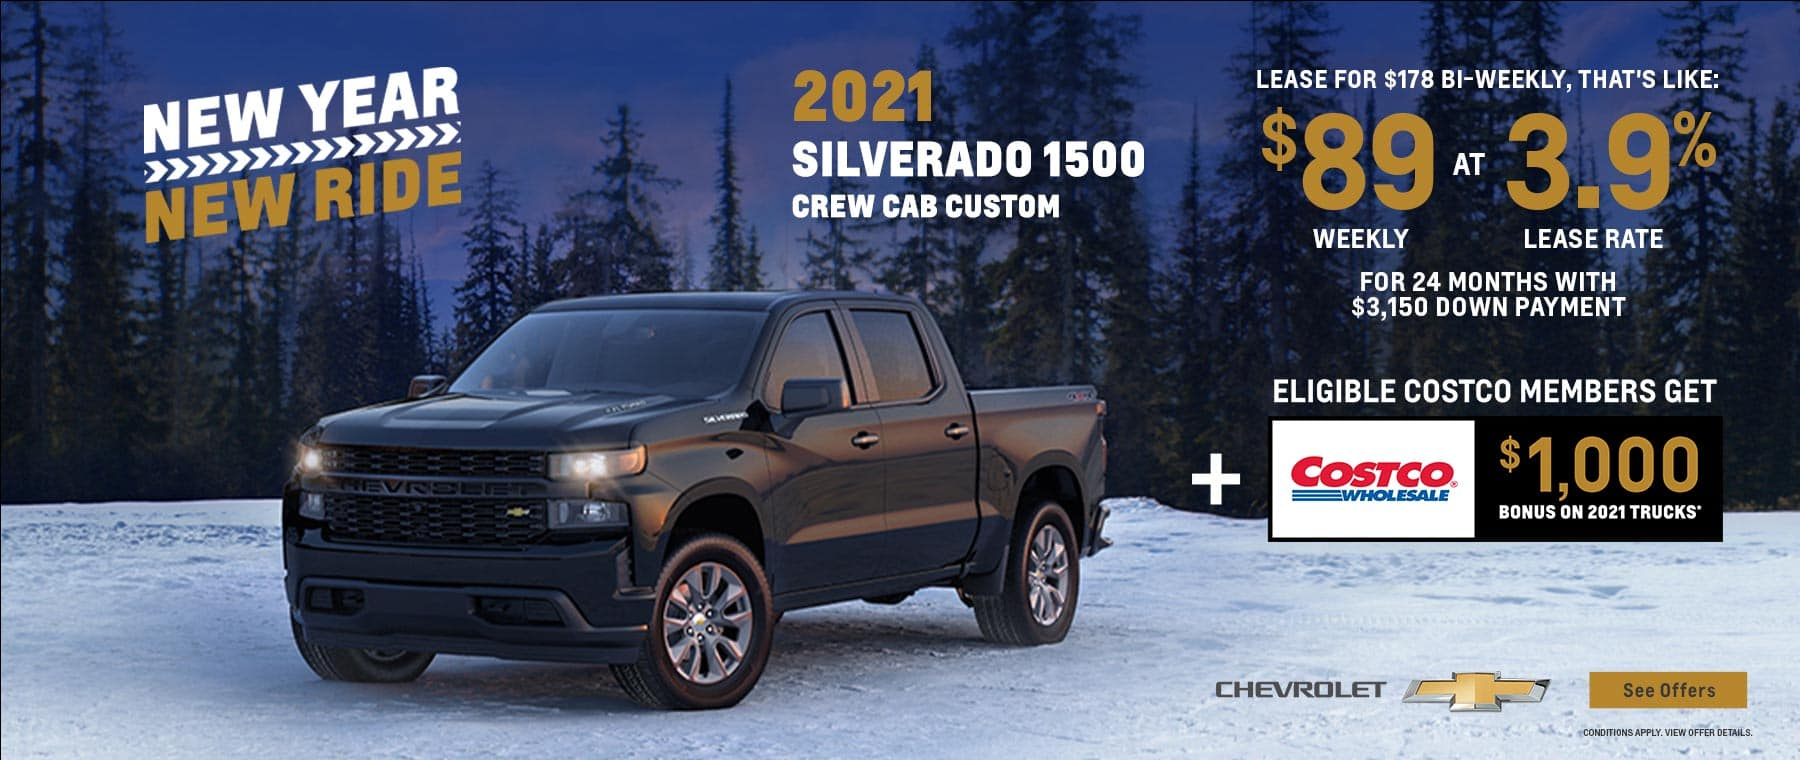 2021_JAN_WST_Chevy_T3_EN_1800x760_TRUCK_SILVERADO-LD-BC